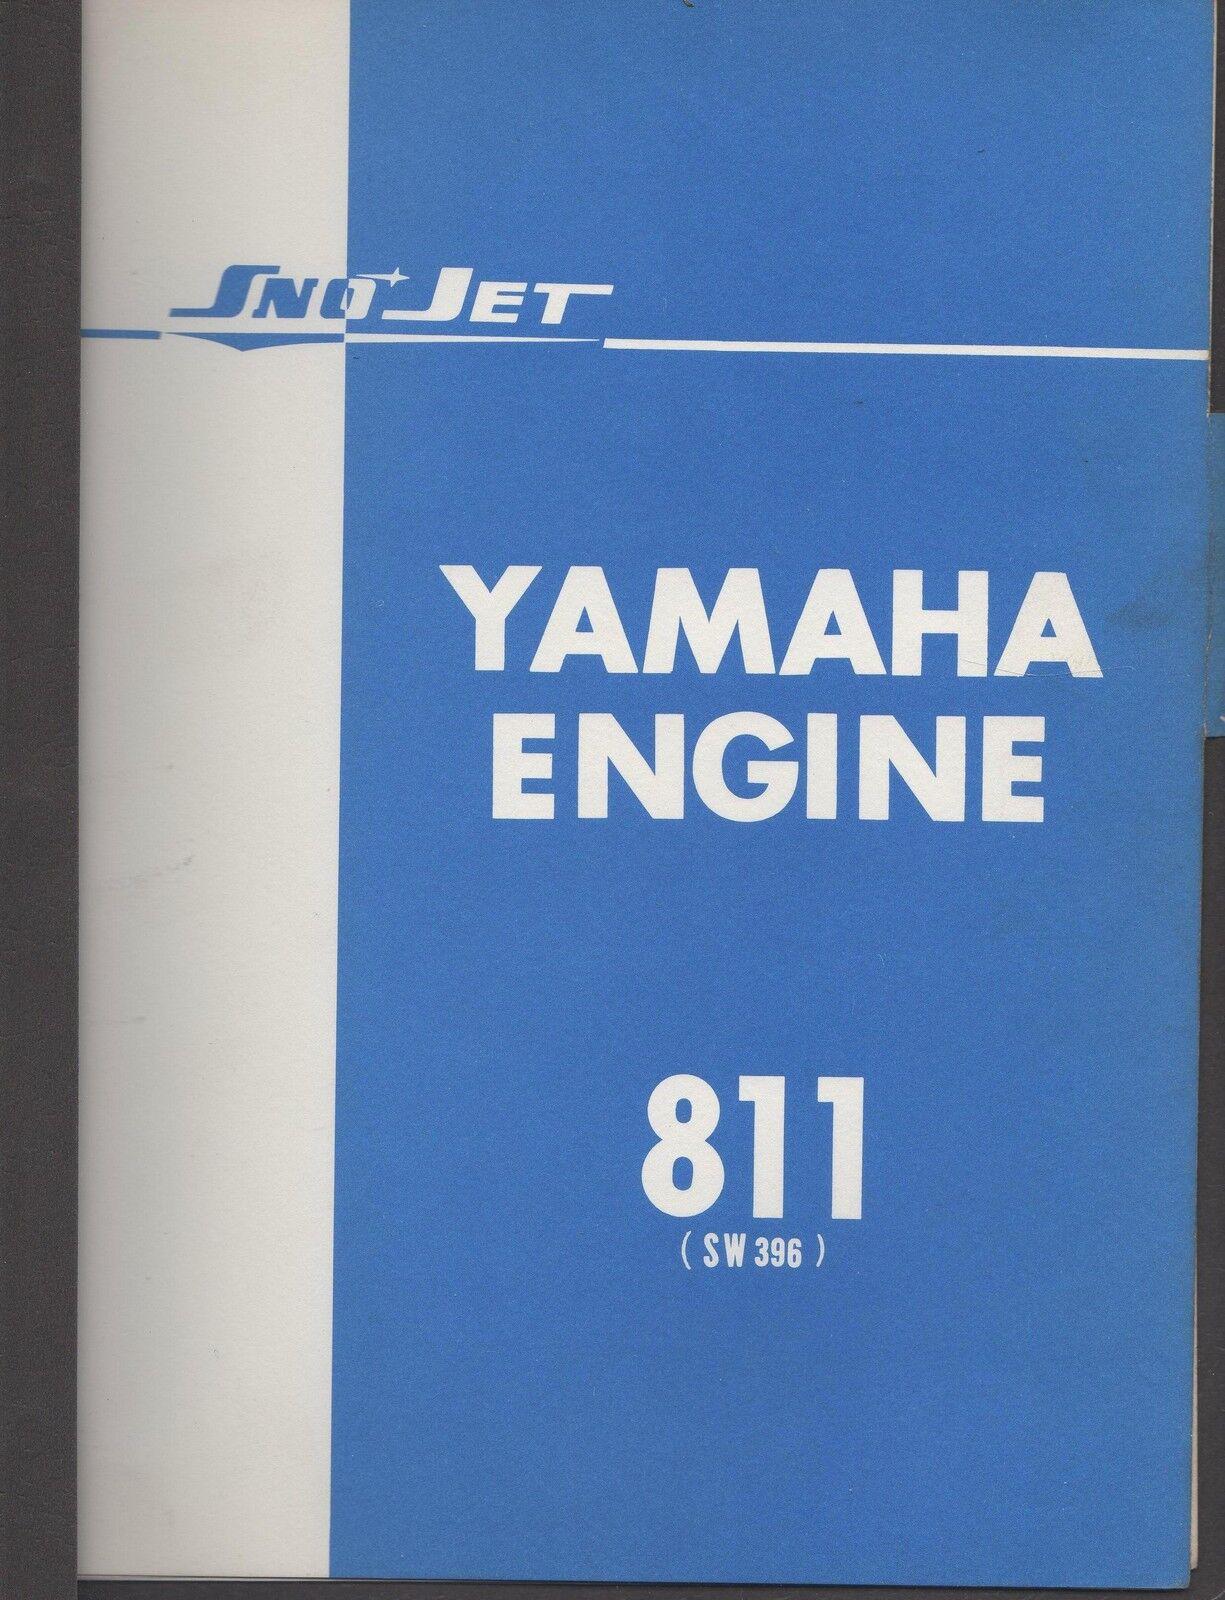 1971 SNOJET SNOWMOBILE YAMAHA ENGINE 811 PARTS MANUAL USED